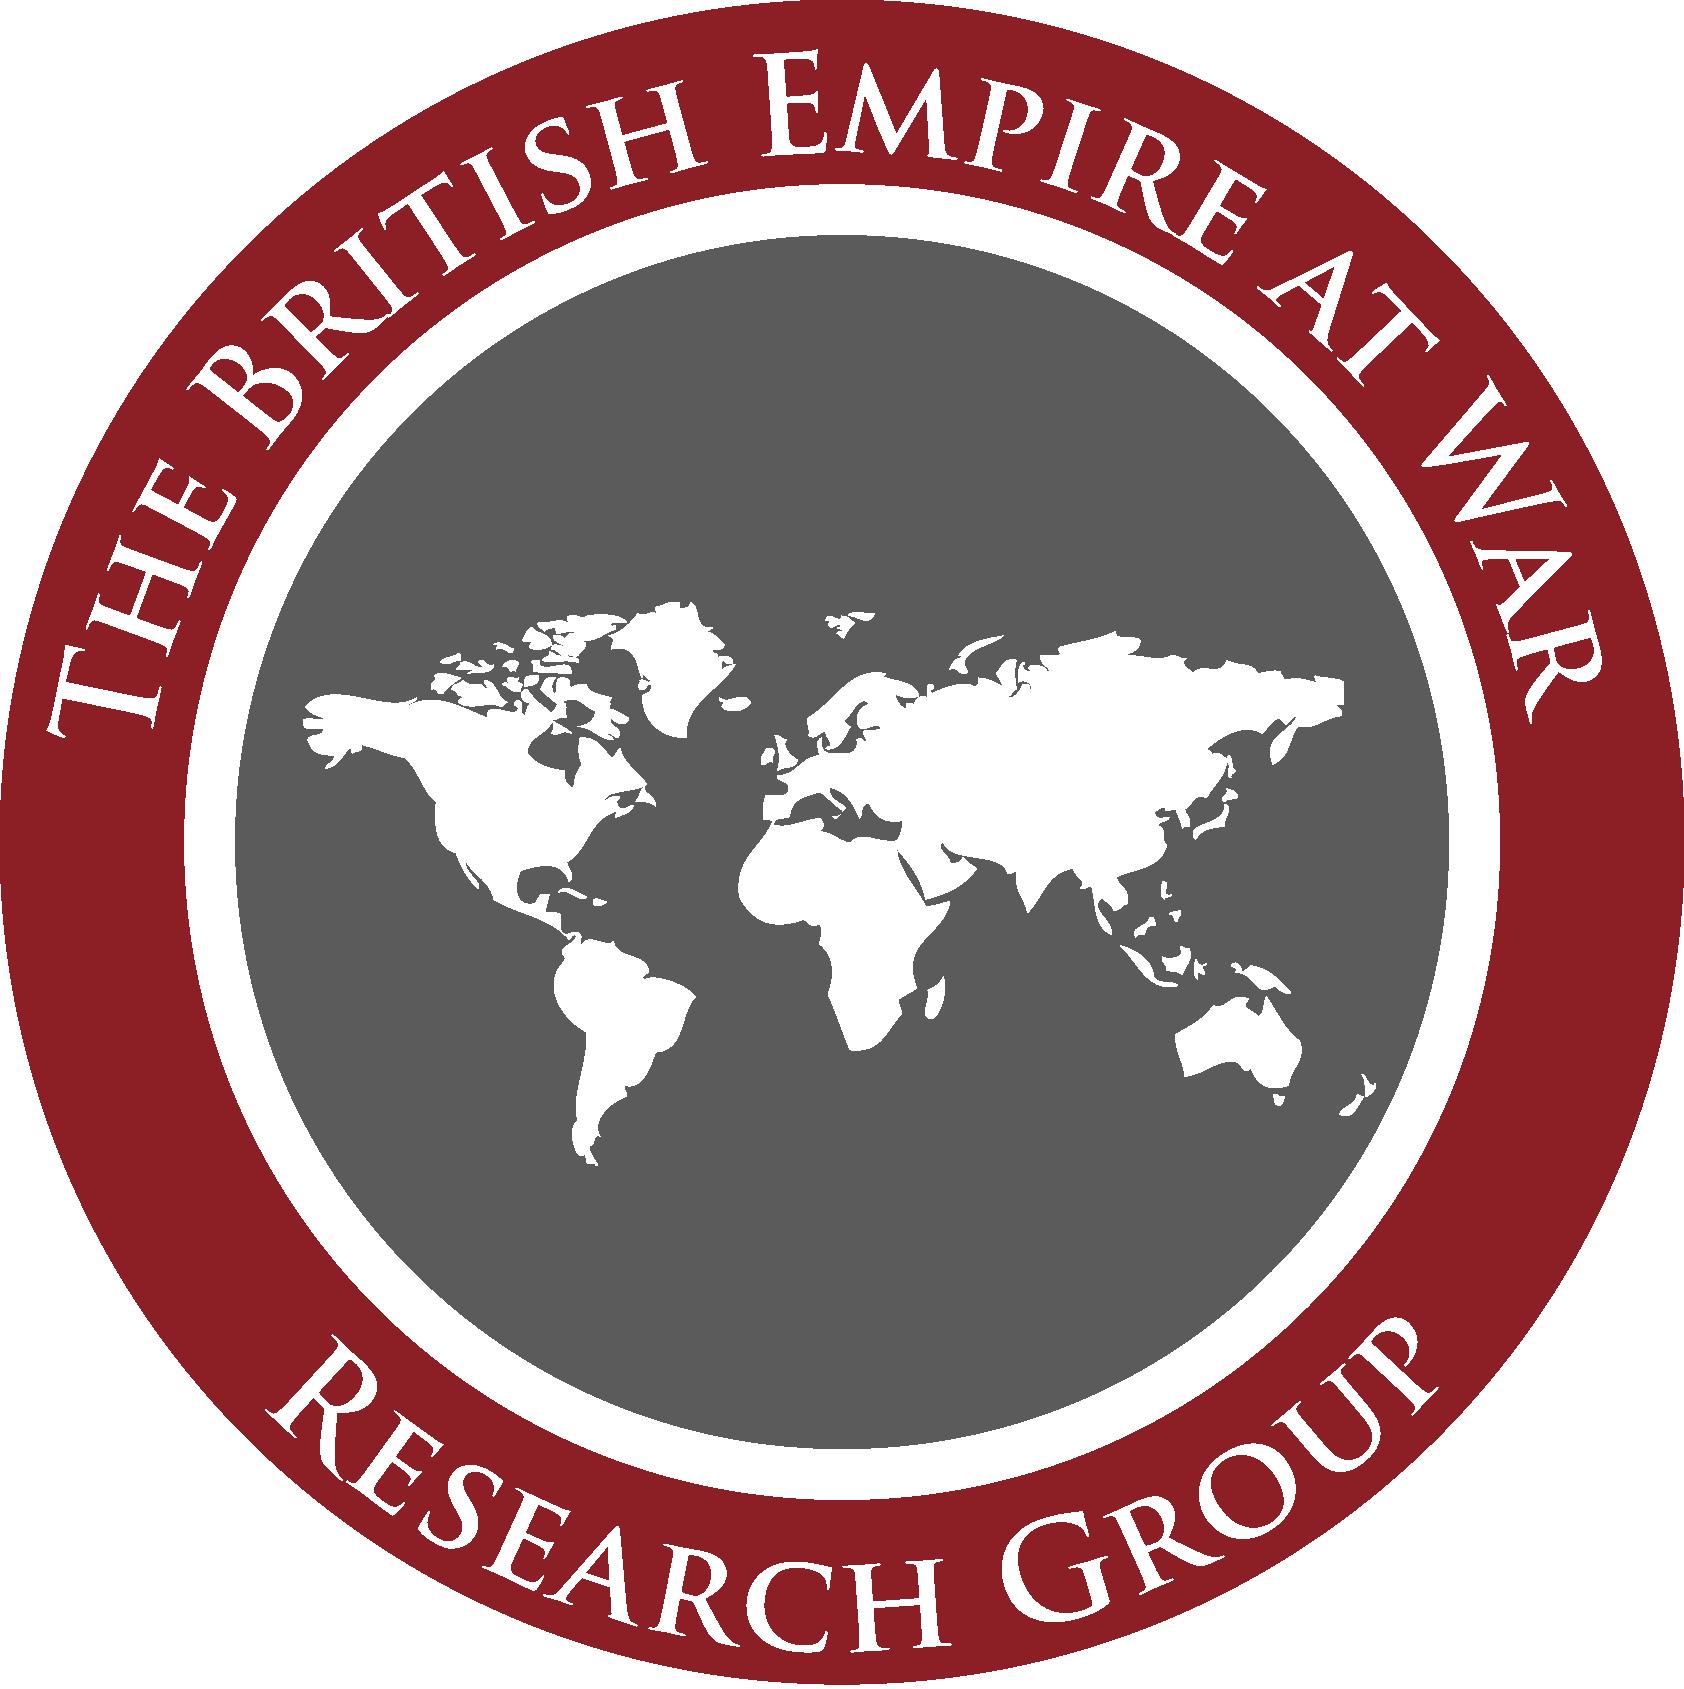 Essay on the British Empire - Studienett.no